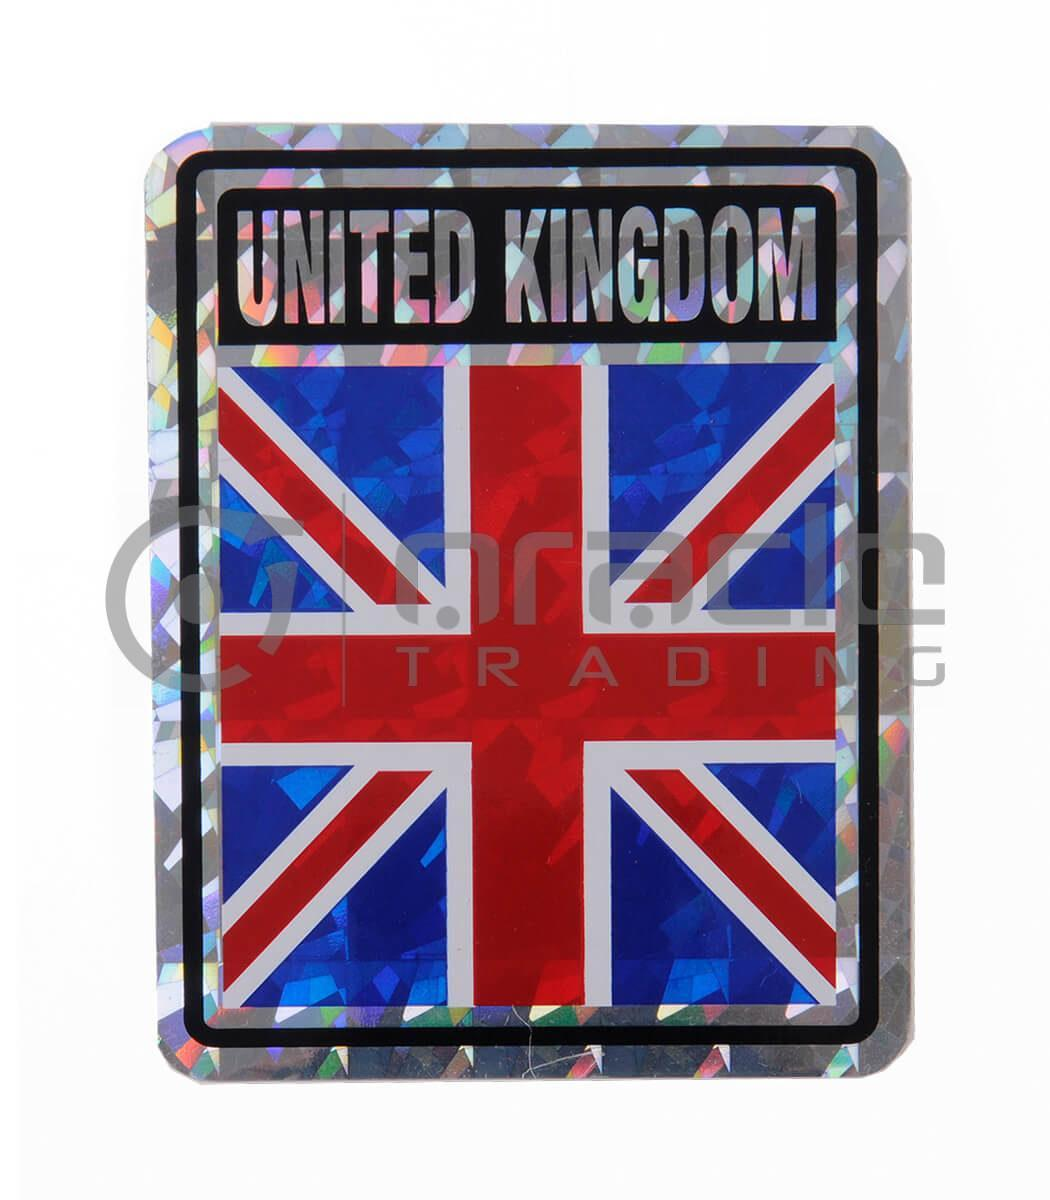 UK Square Bumper Sticker (United Kingdom)